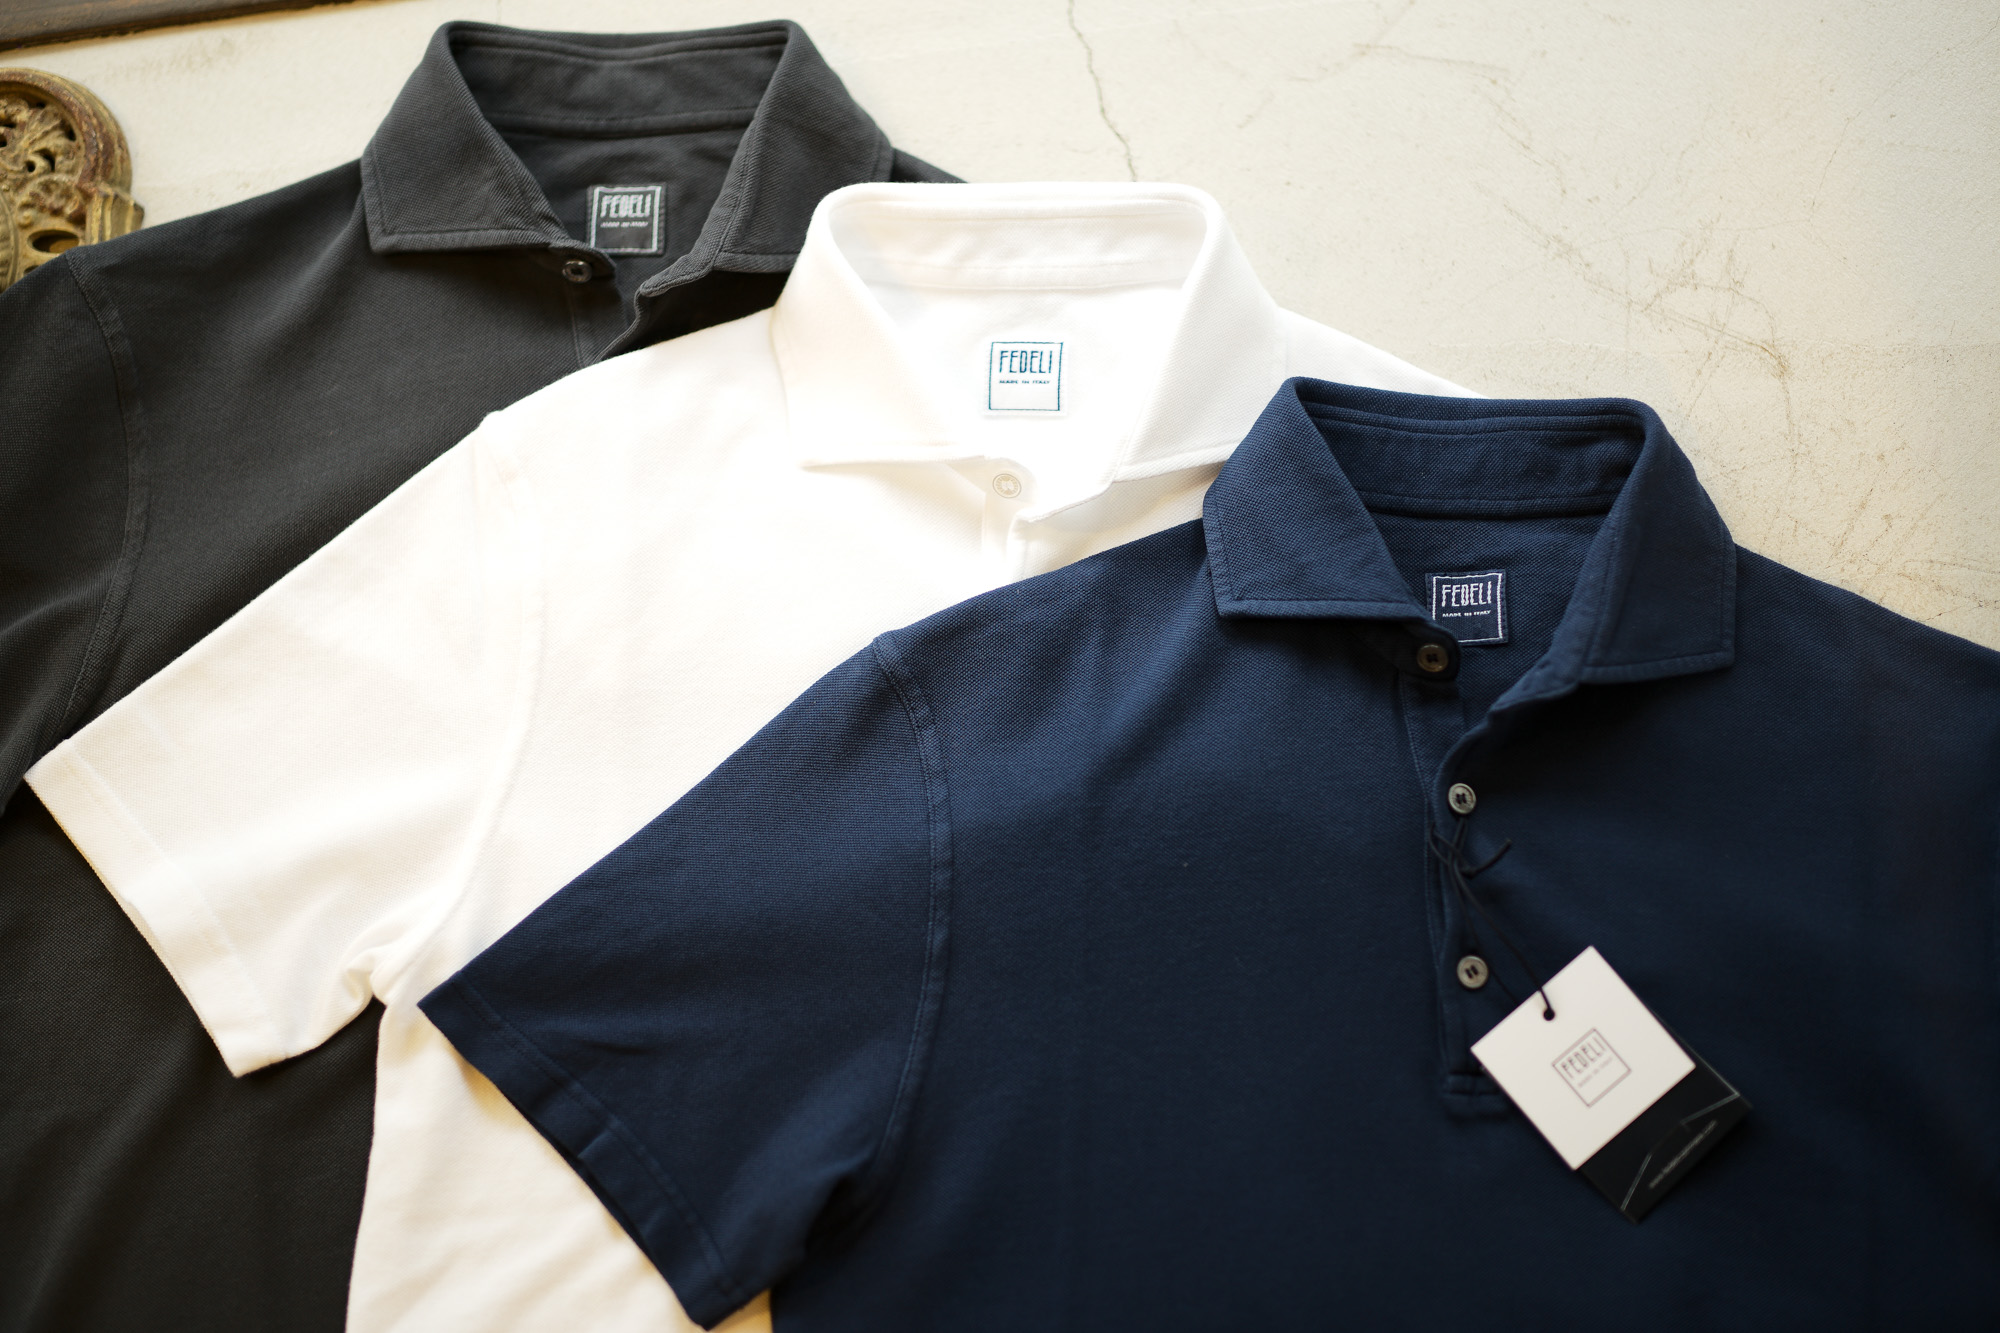 FEDELI (フェデーリ) Piquet Polo Shirt (ピケ ポロシャツ) カノコ ポロシャツ BLACK(ブラック・36),WHITE (ホワイト・41),NAVY(ネイビー・2) made in italy (イタリア製) 2019 春夏新作 愛知 名古屋 altoediritto アルトエデリット